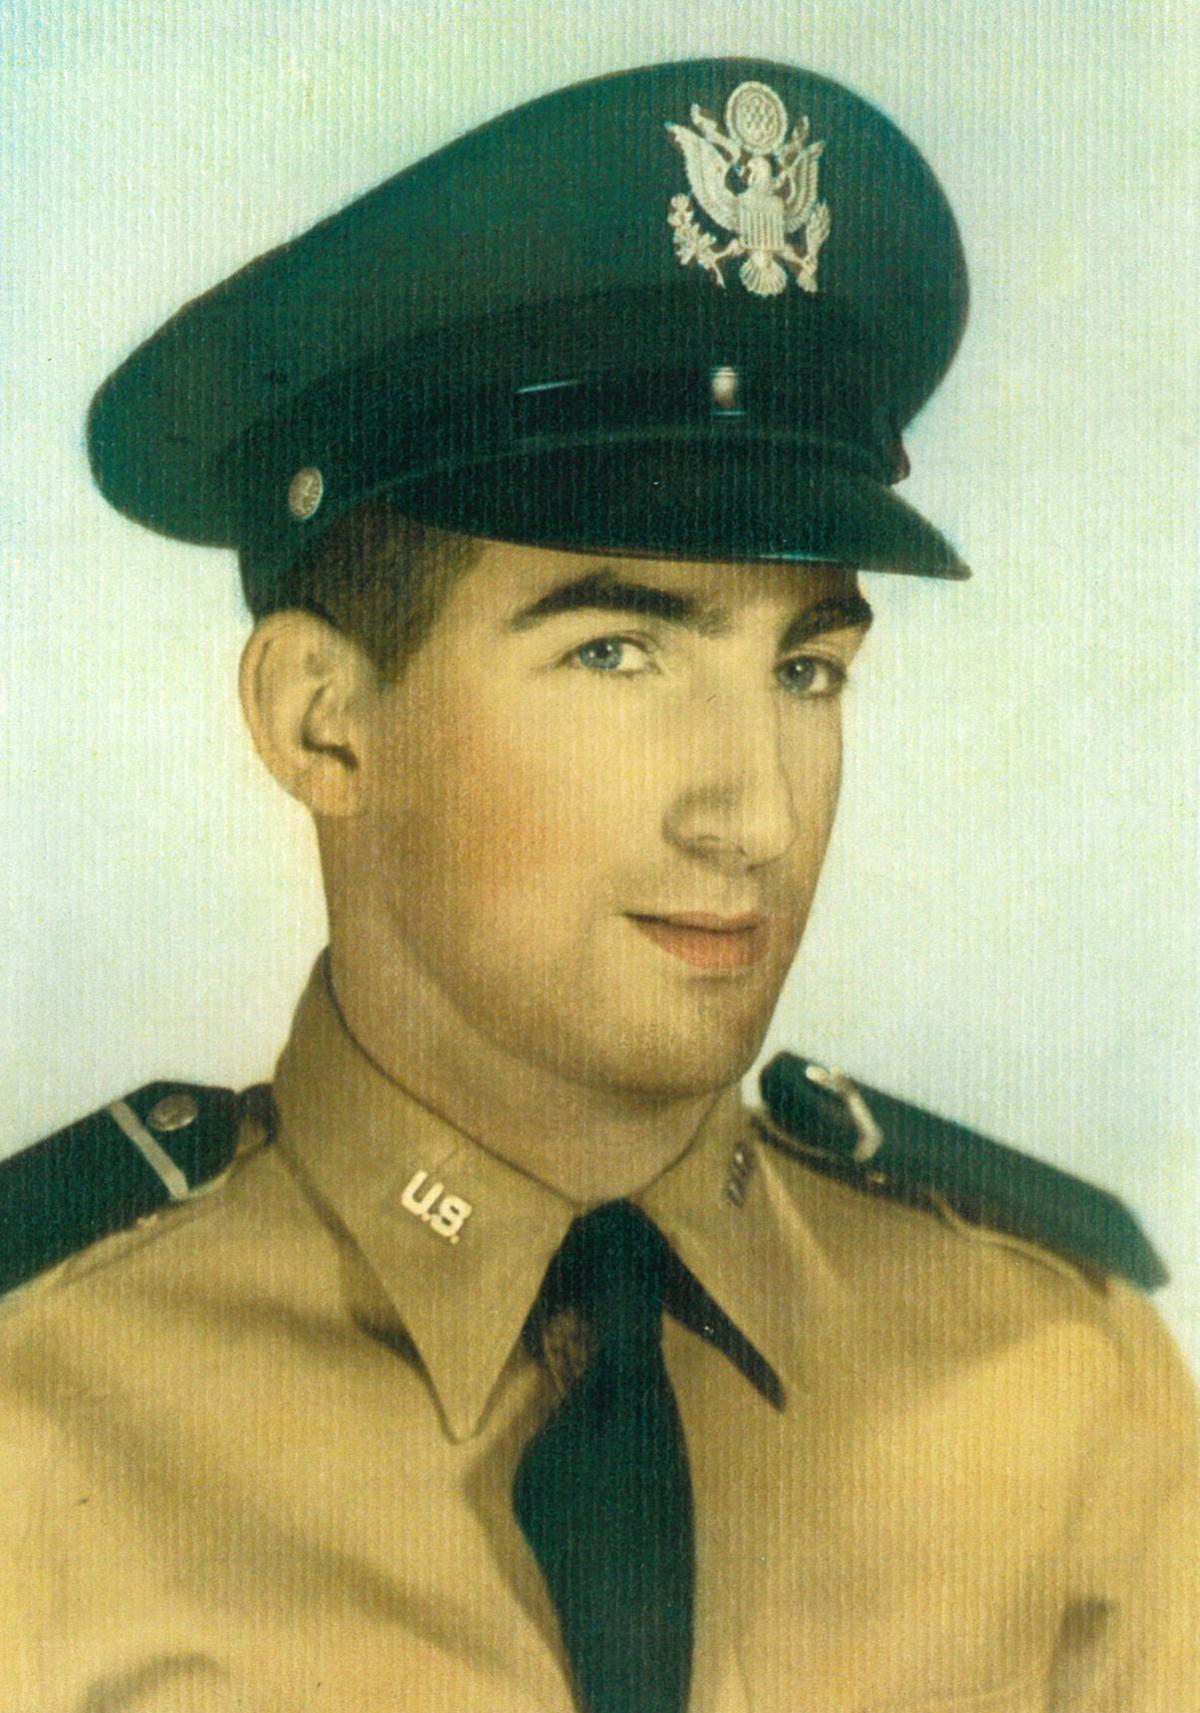 Scherrer Jr., Fredrick Earnest